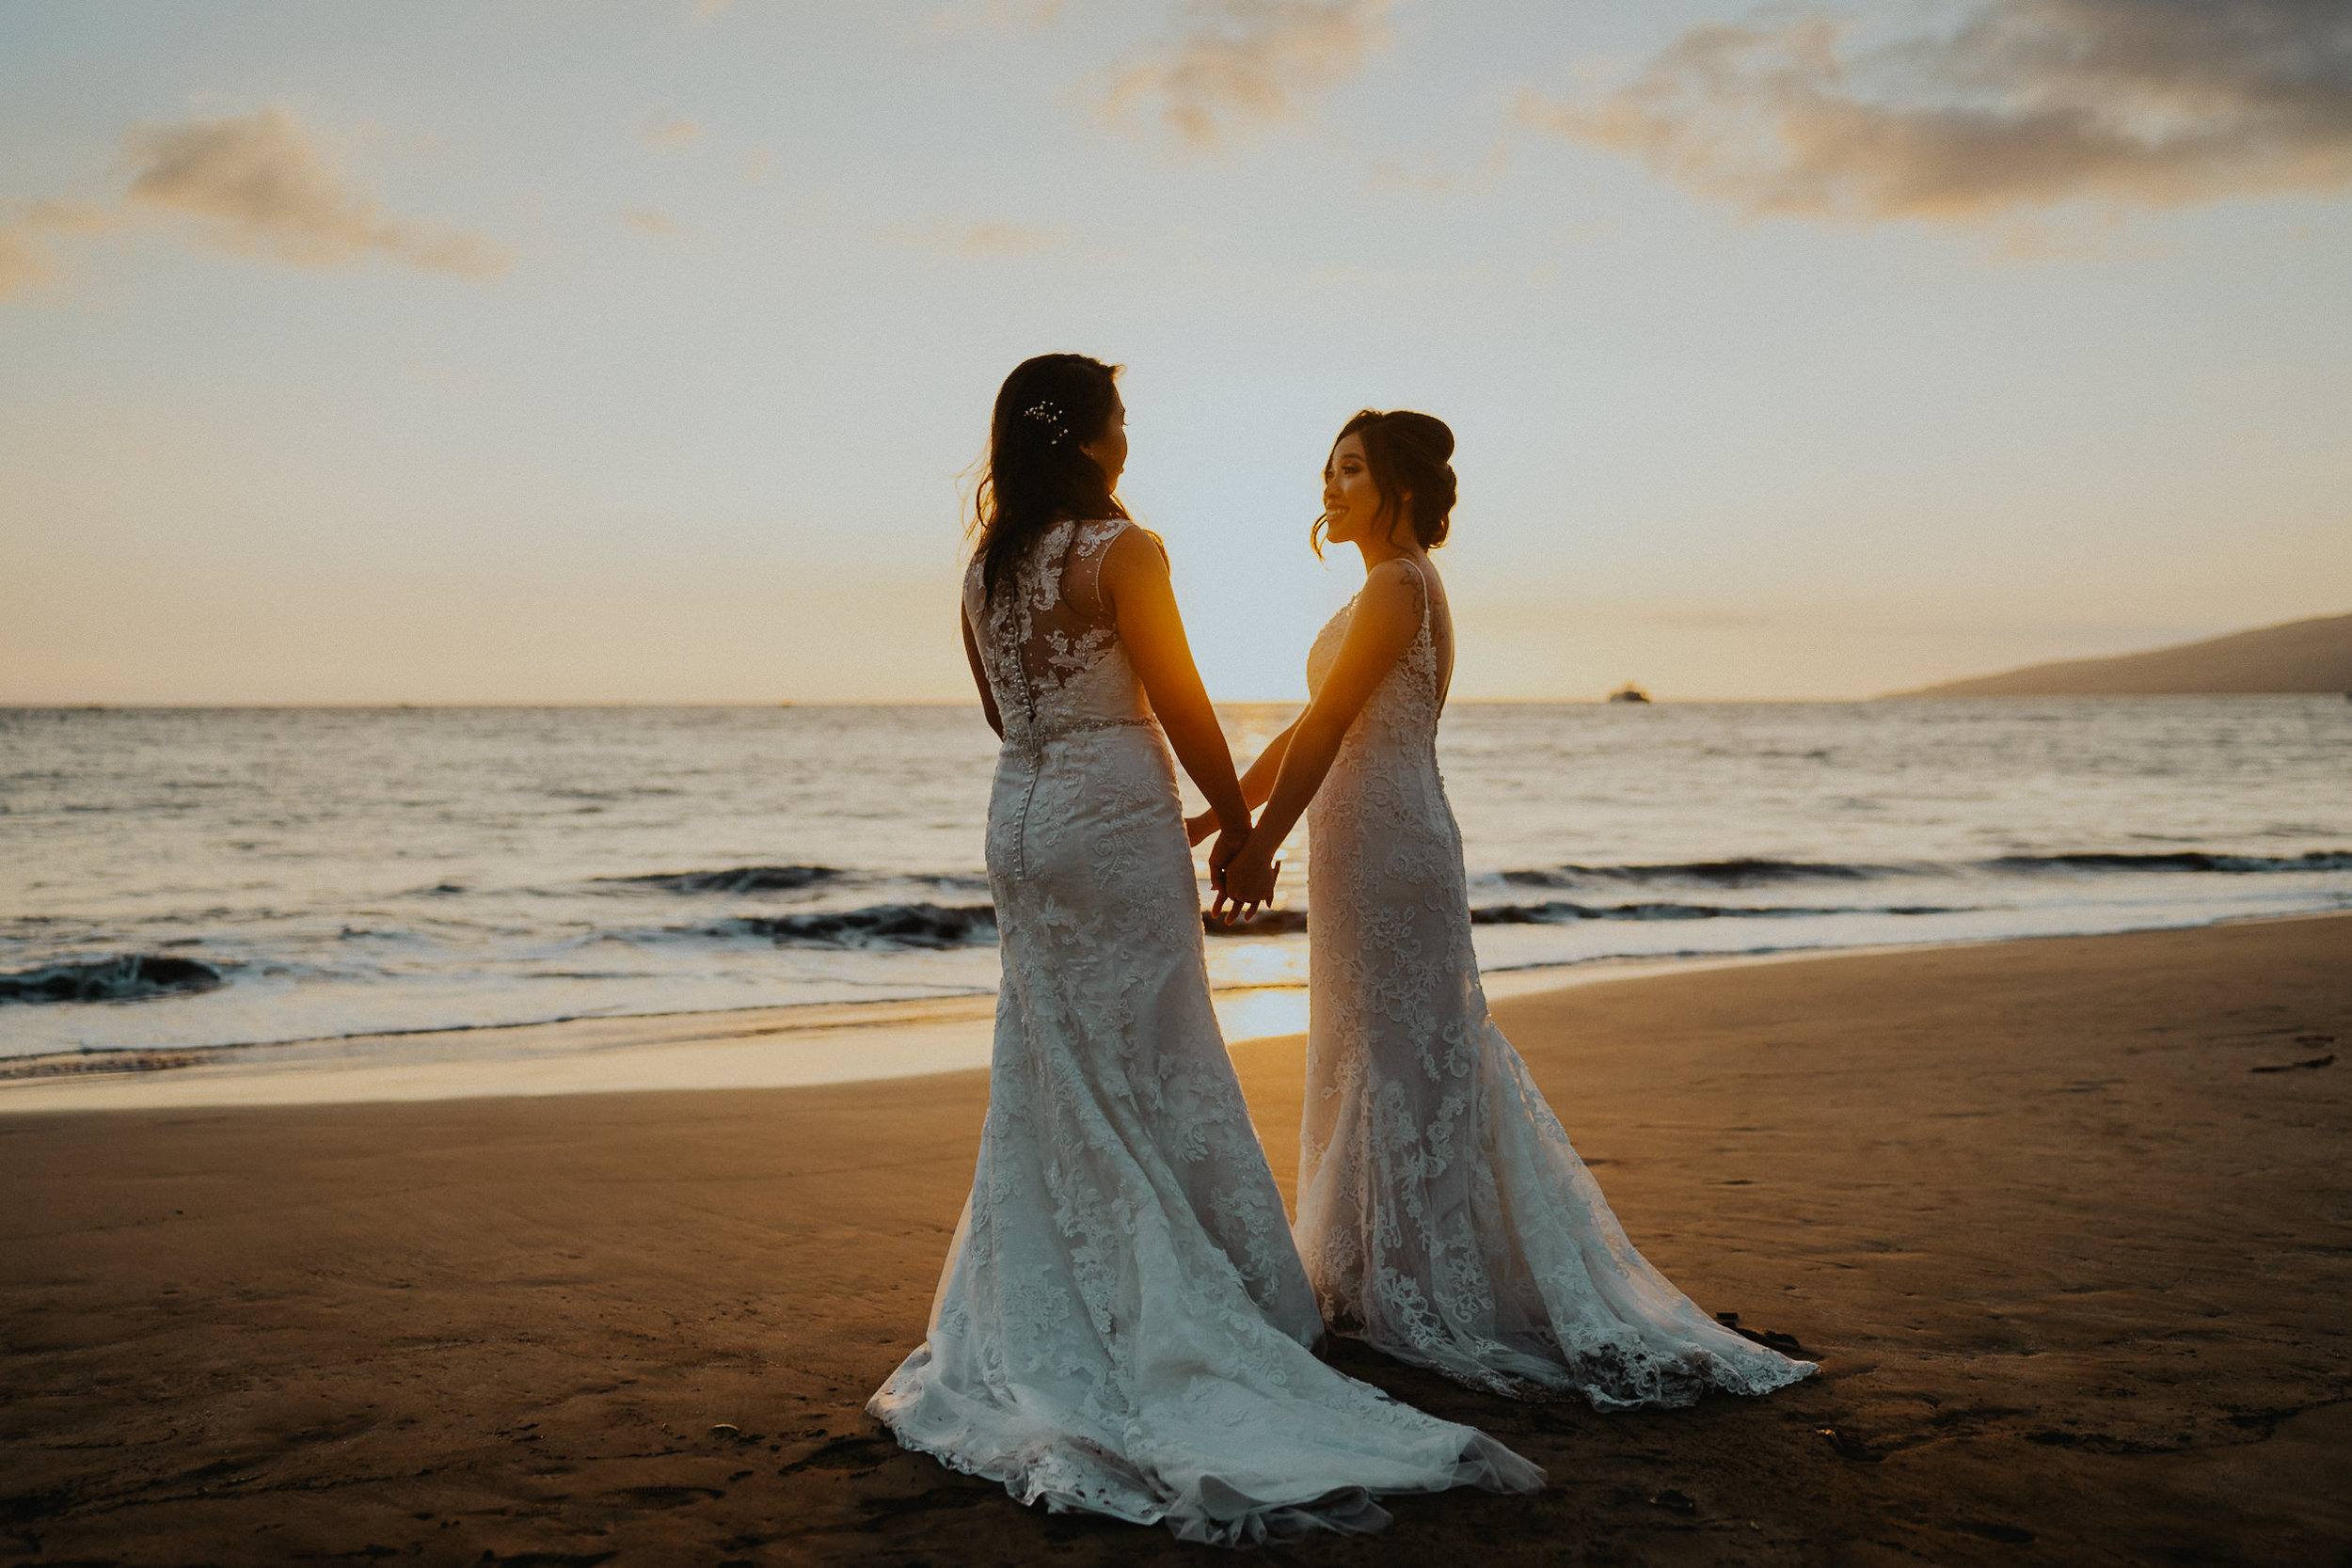 Maui_Destination_wedding_Alfred_Tang-50.jpg